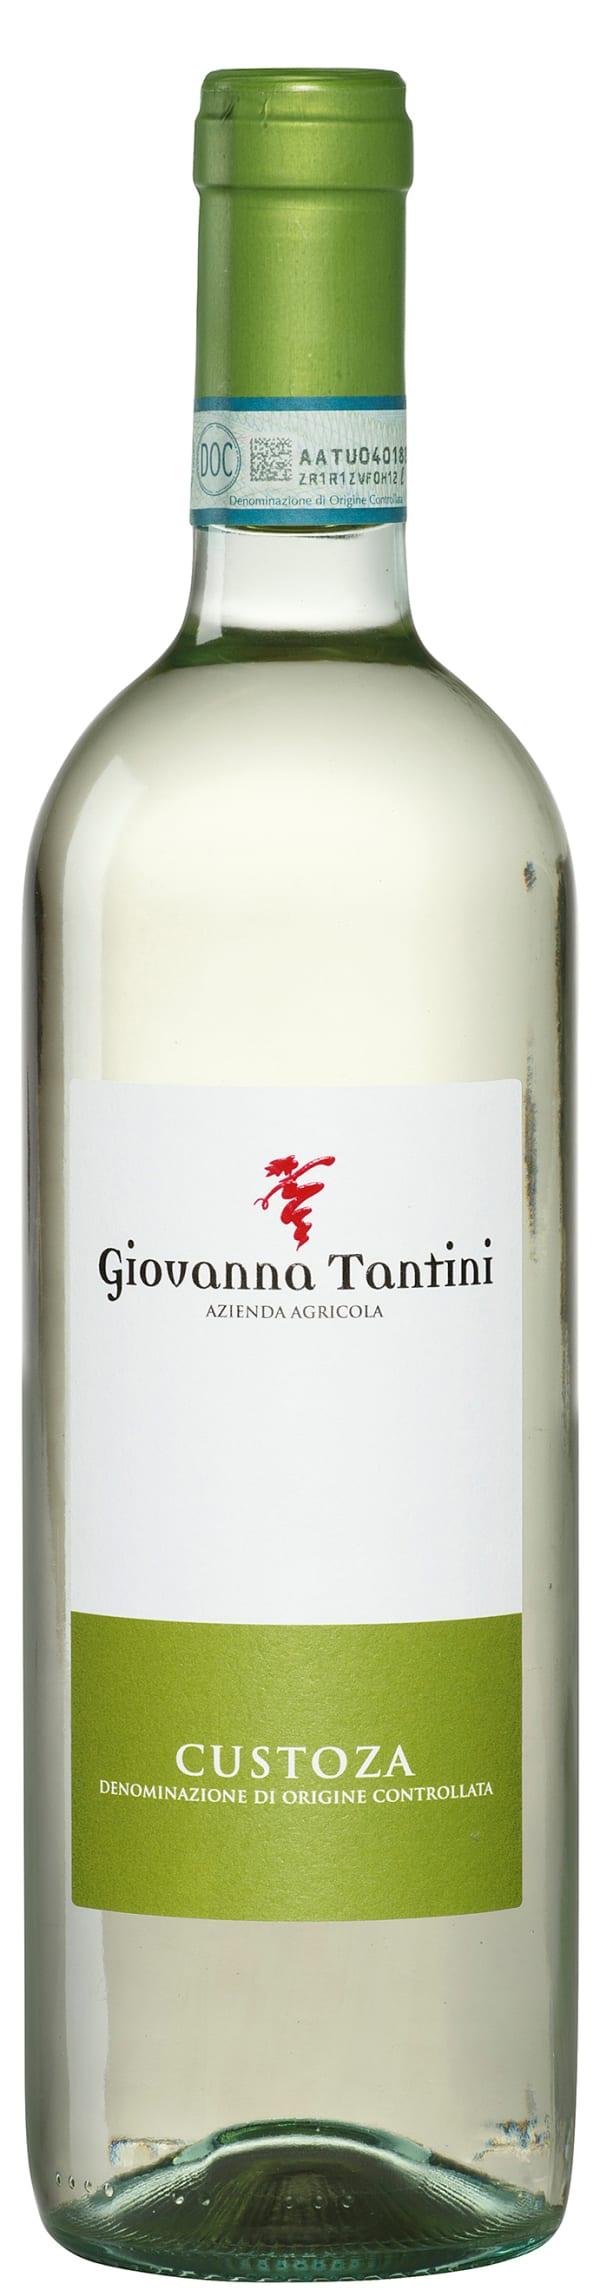 Giovanna Tantini Bianco 2016